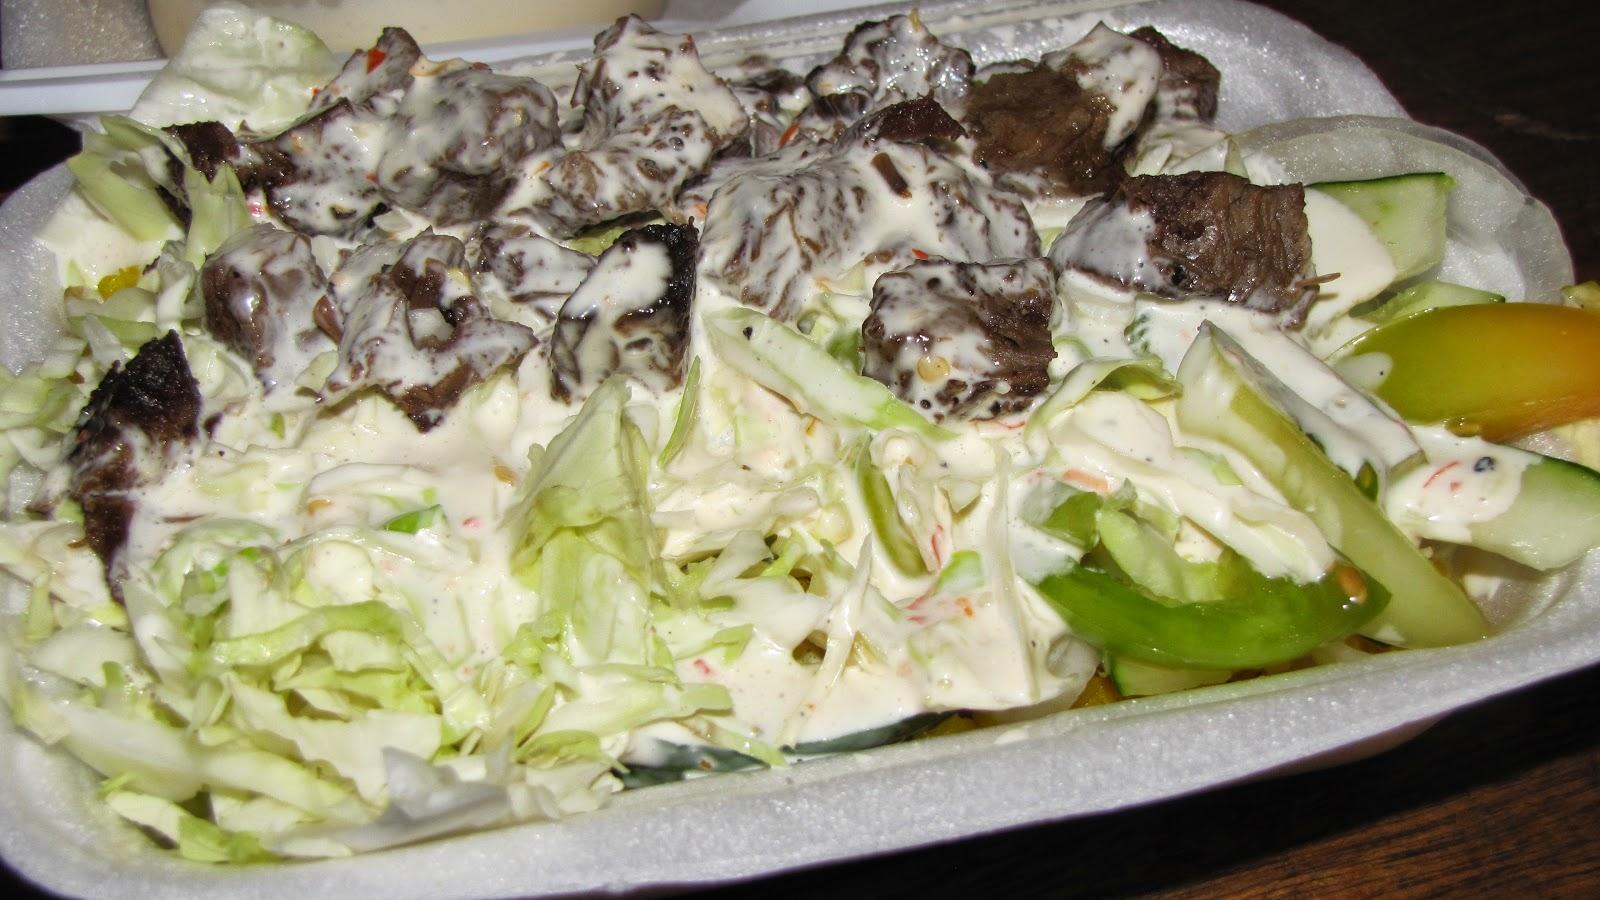 FTW! Blog, Jafar's Shawarma Rice, shawarma rice, #032eatdrink